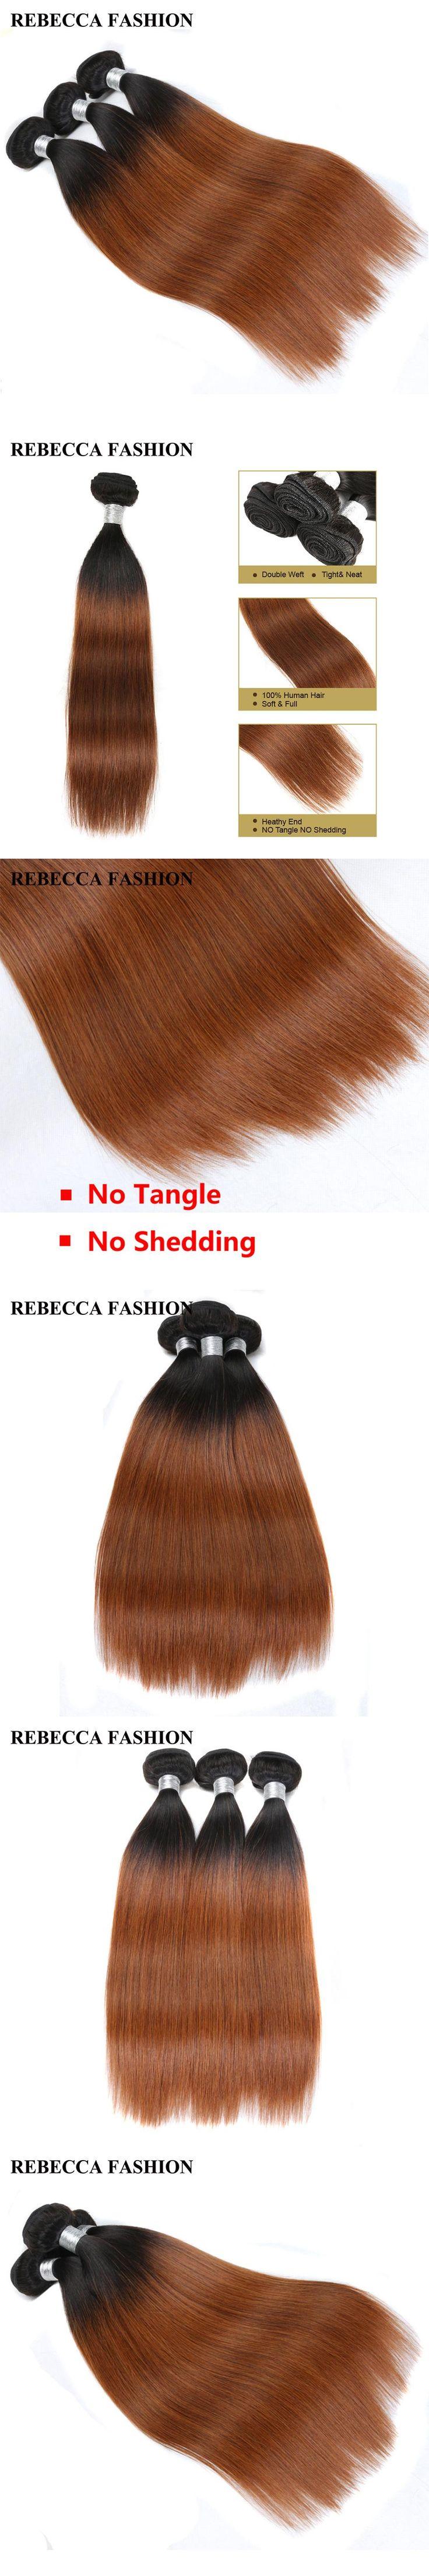 Rebecca Ombre Human Hair Bundles 300g Remy Brazilian Straight Hair Weave 3 Bundles Salon Ombre Brown Hair Extennsions T1b30